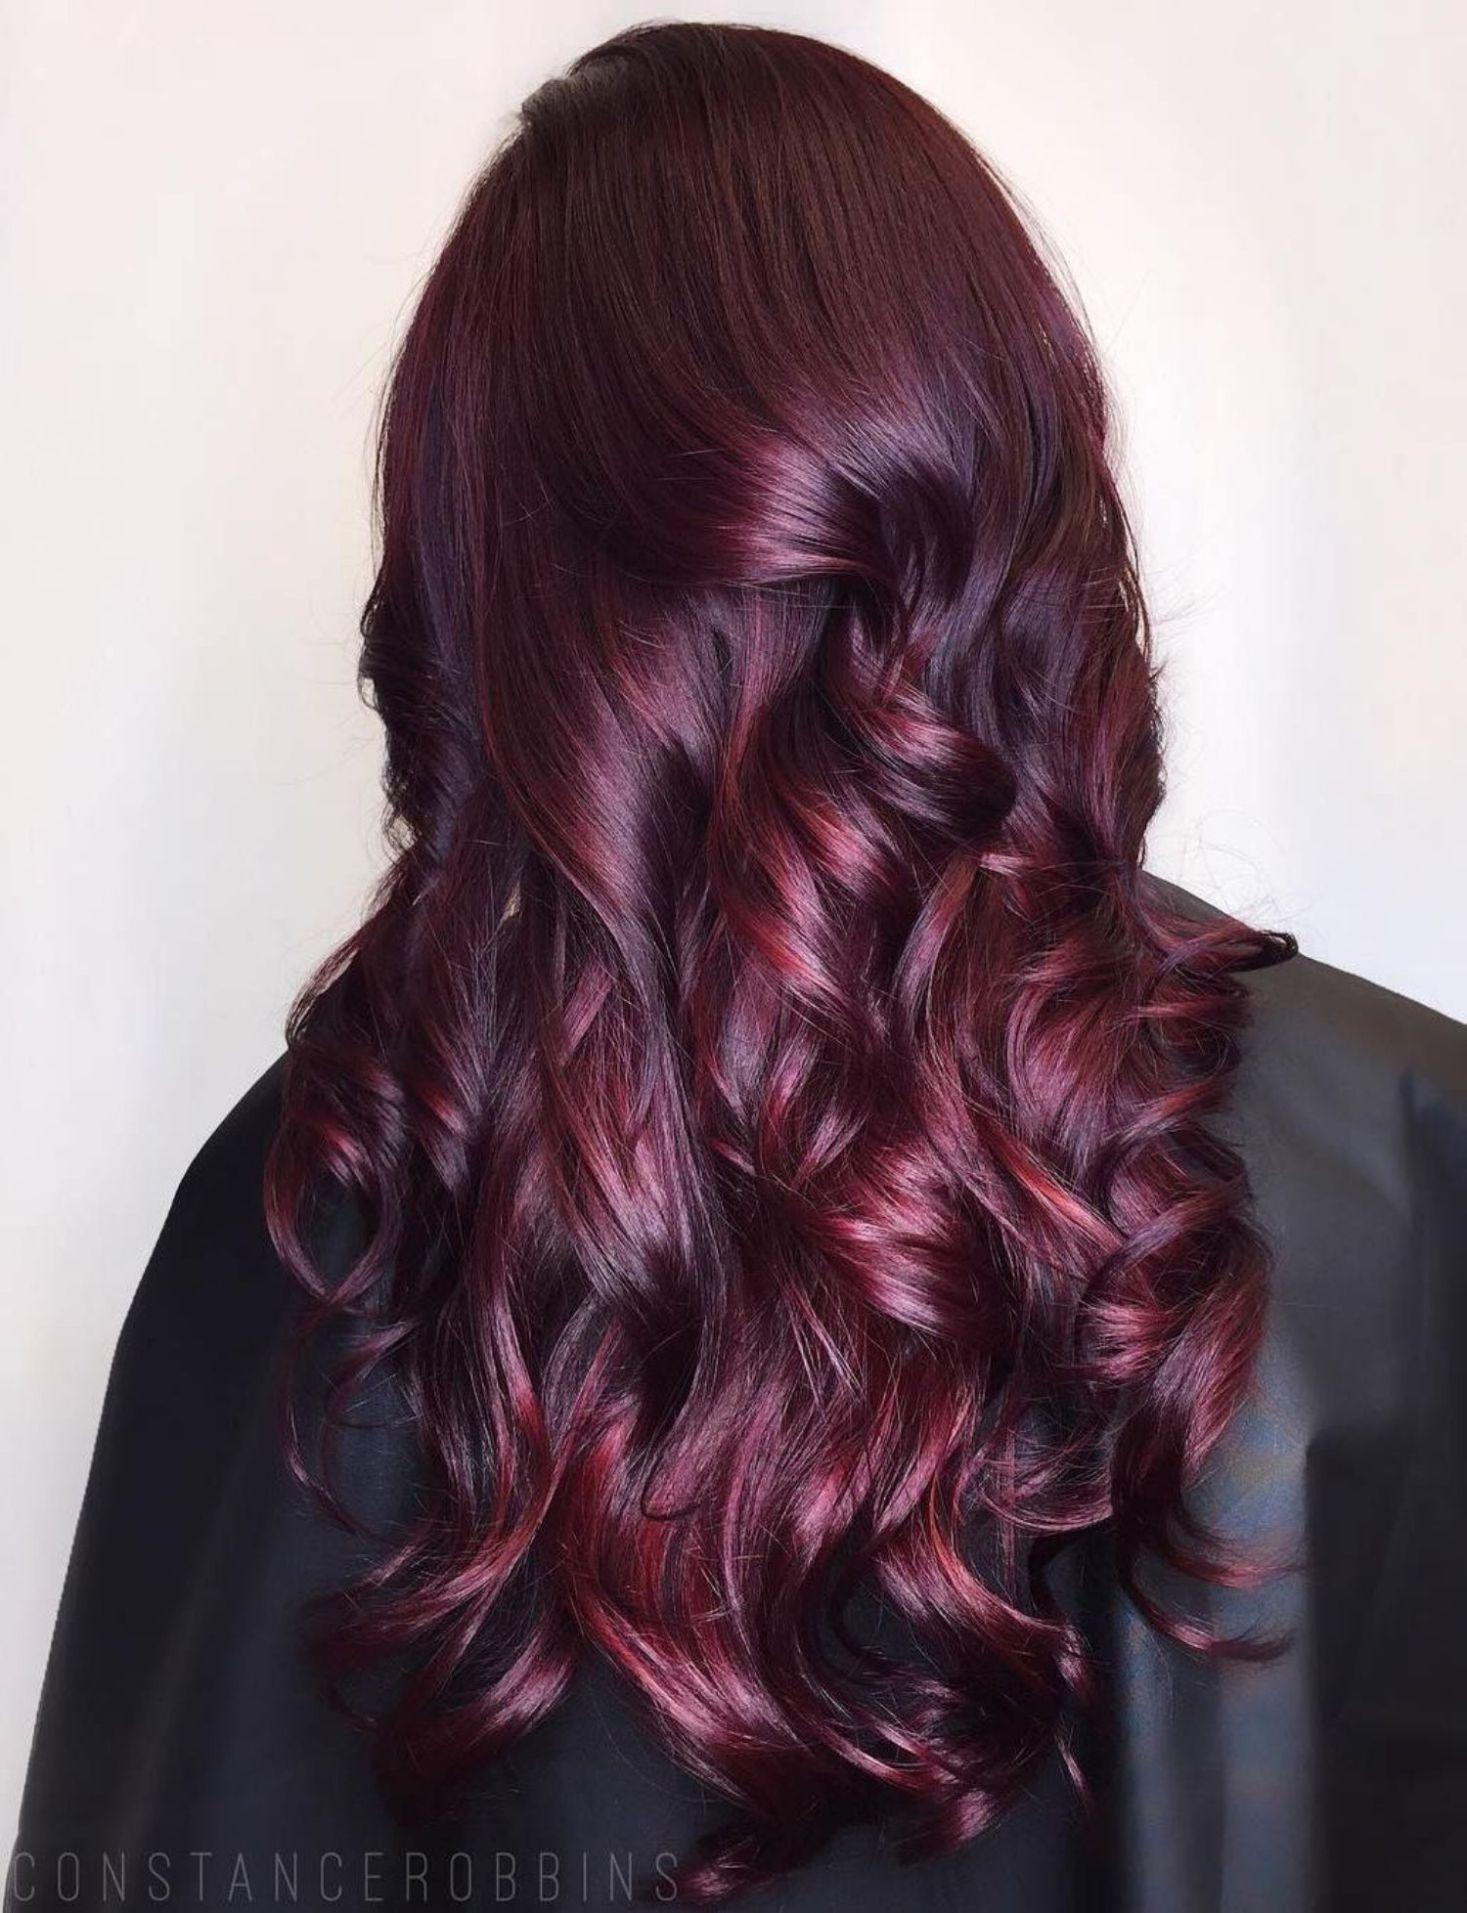 Best boy hair color  shades of burgundy hair dark burgundy maroon burgundy with red